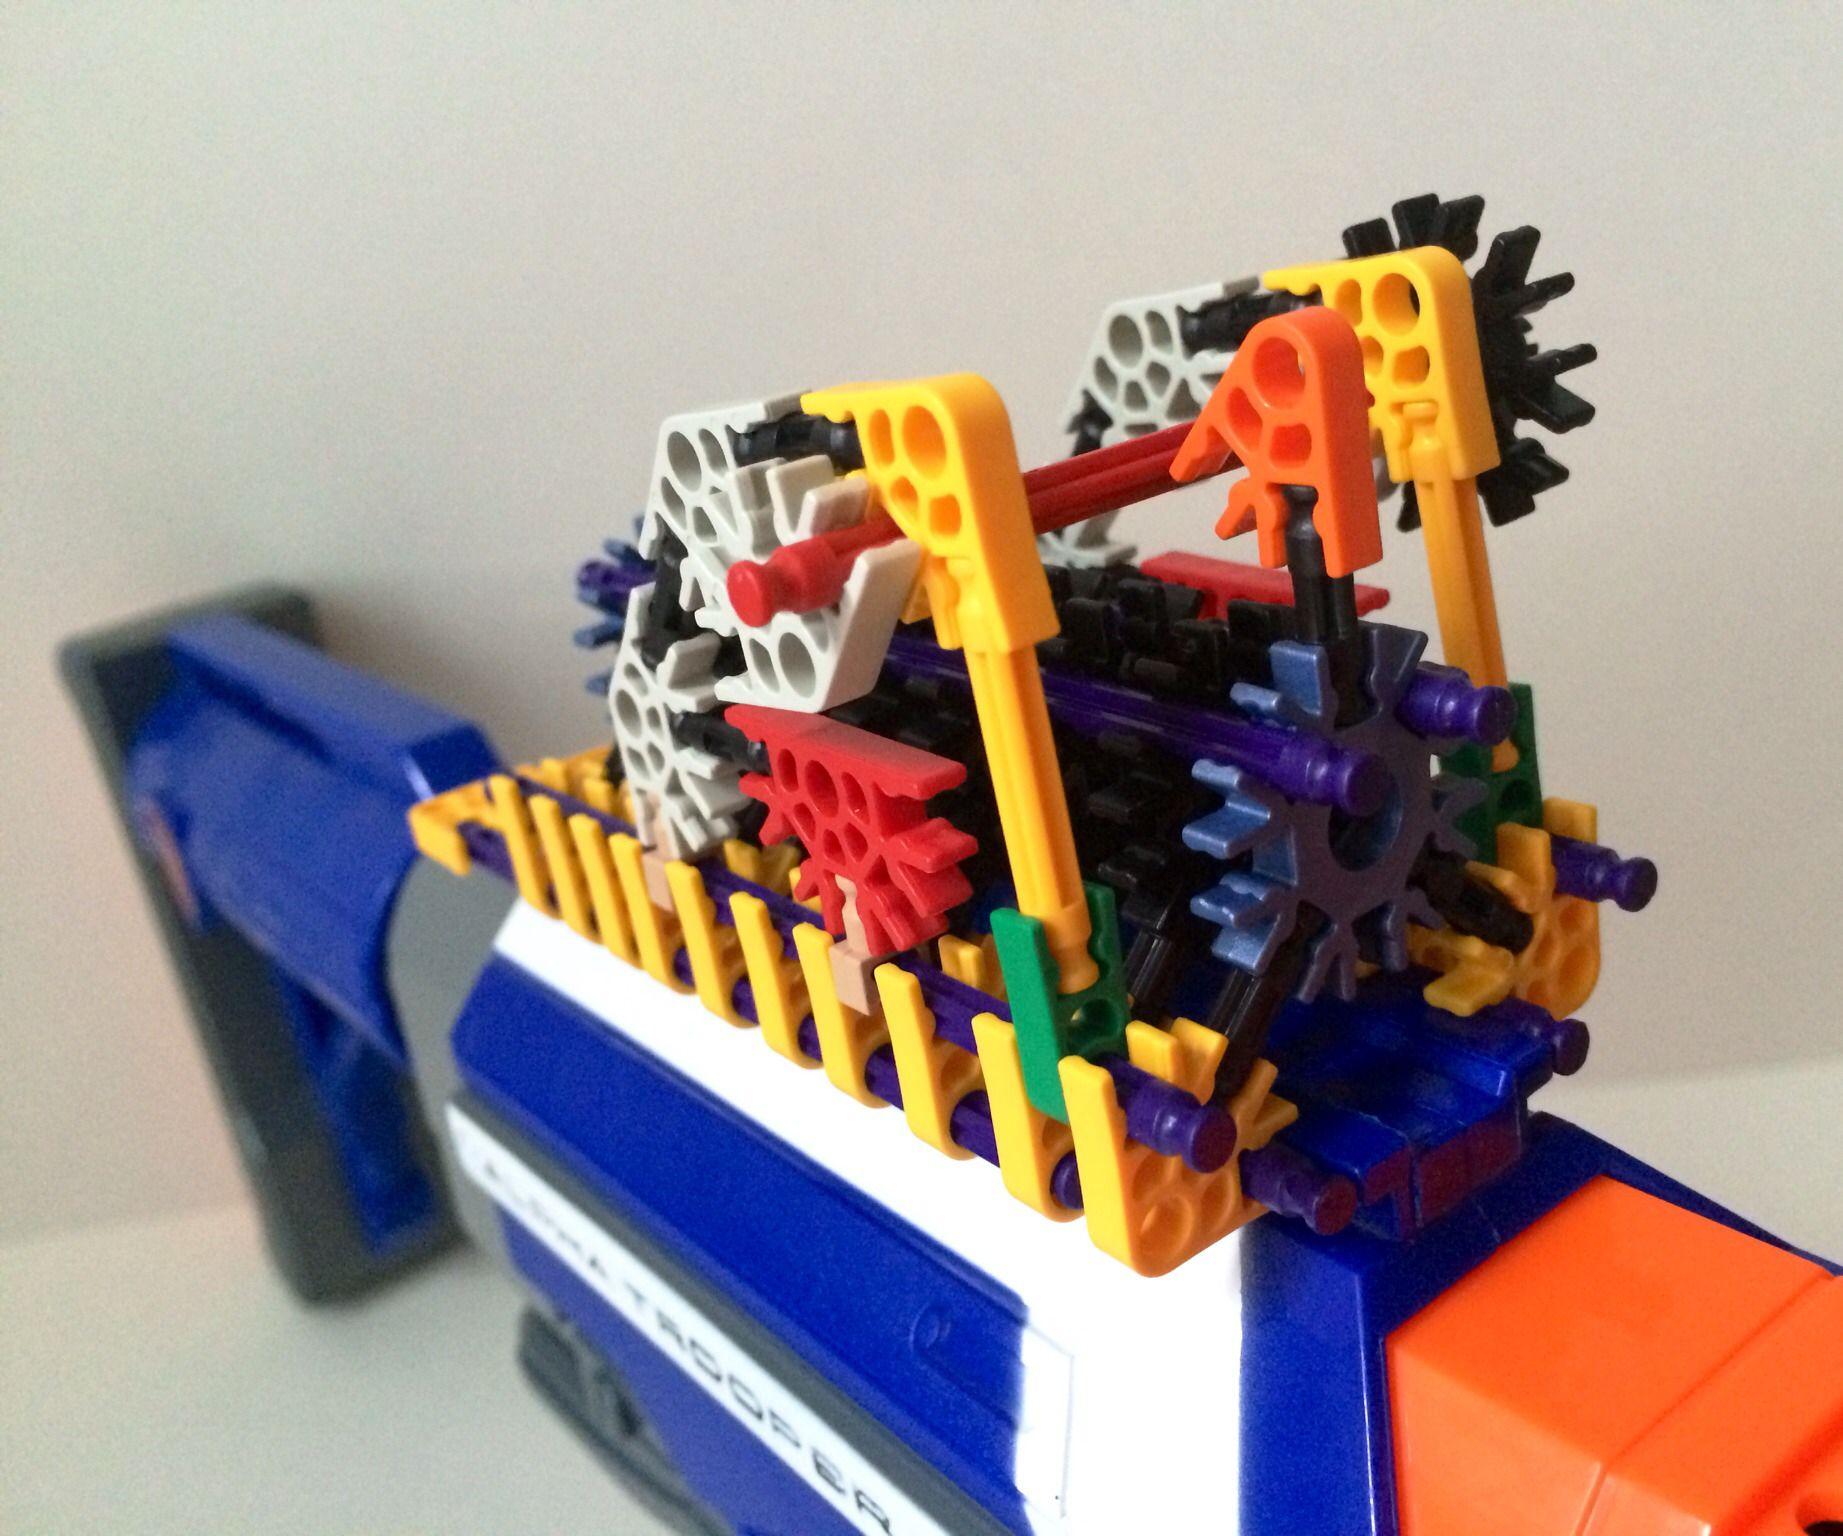 Make A K'nex Custom Attachment For Your Nerf Blaster!